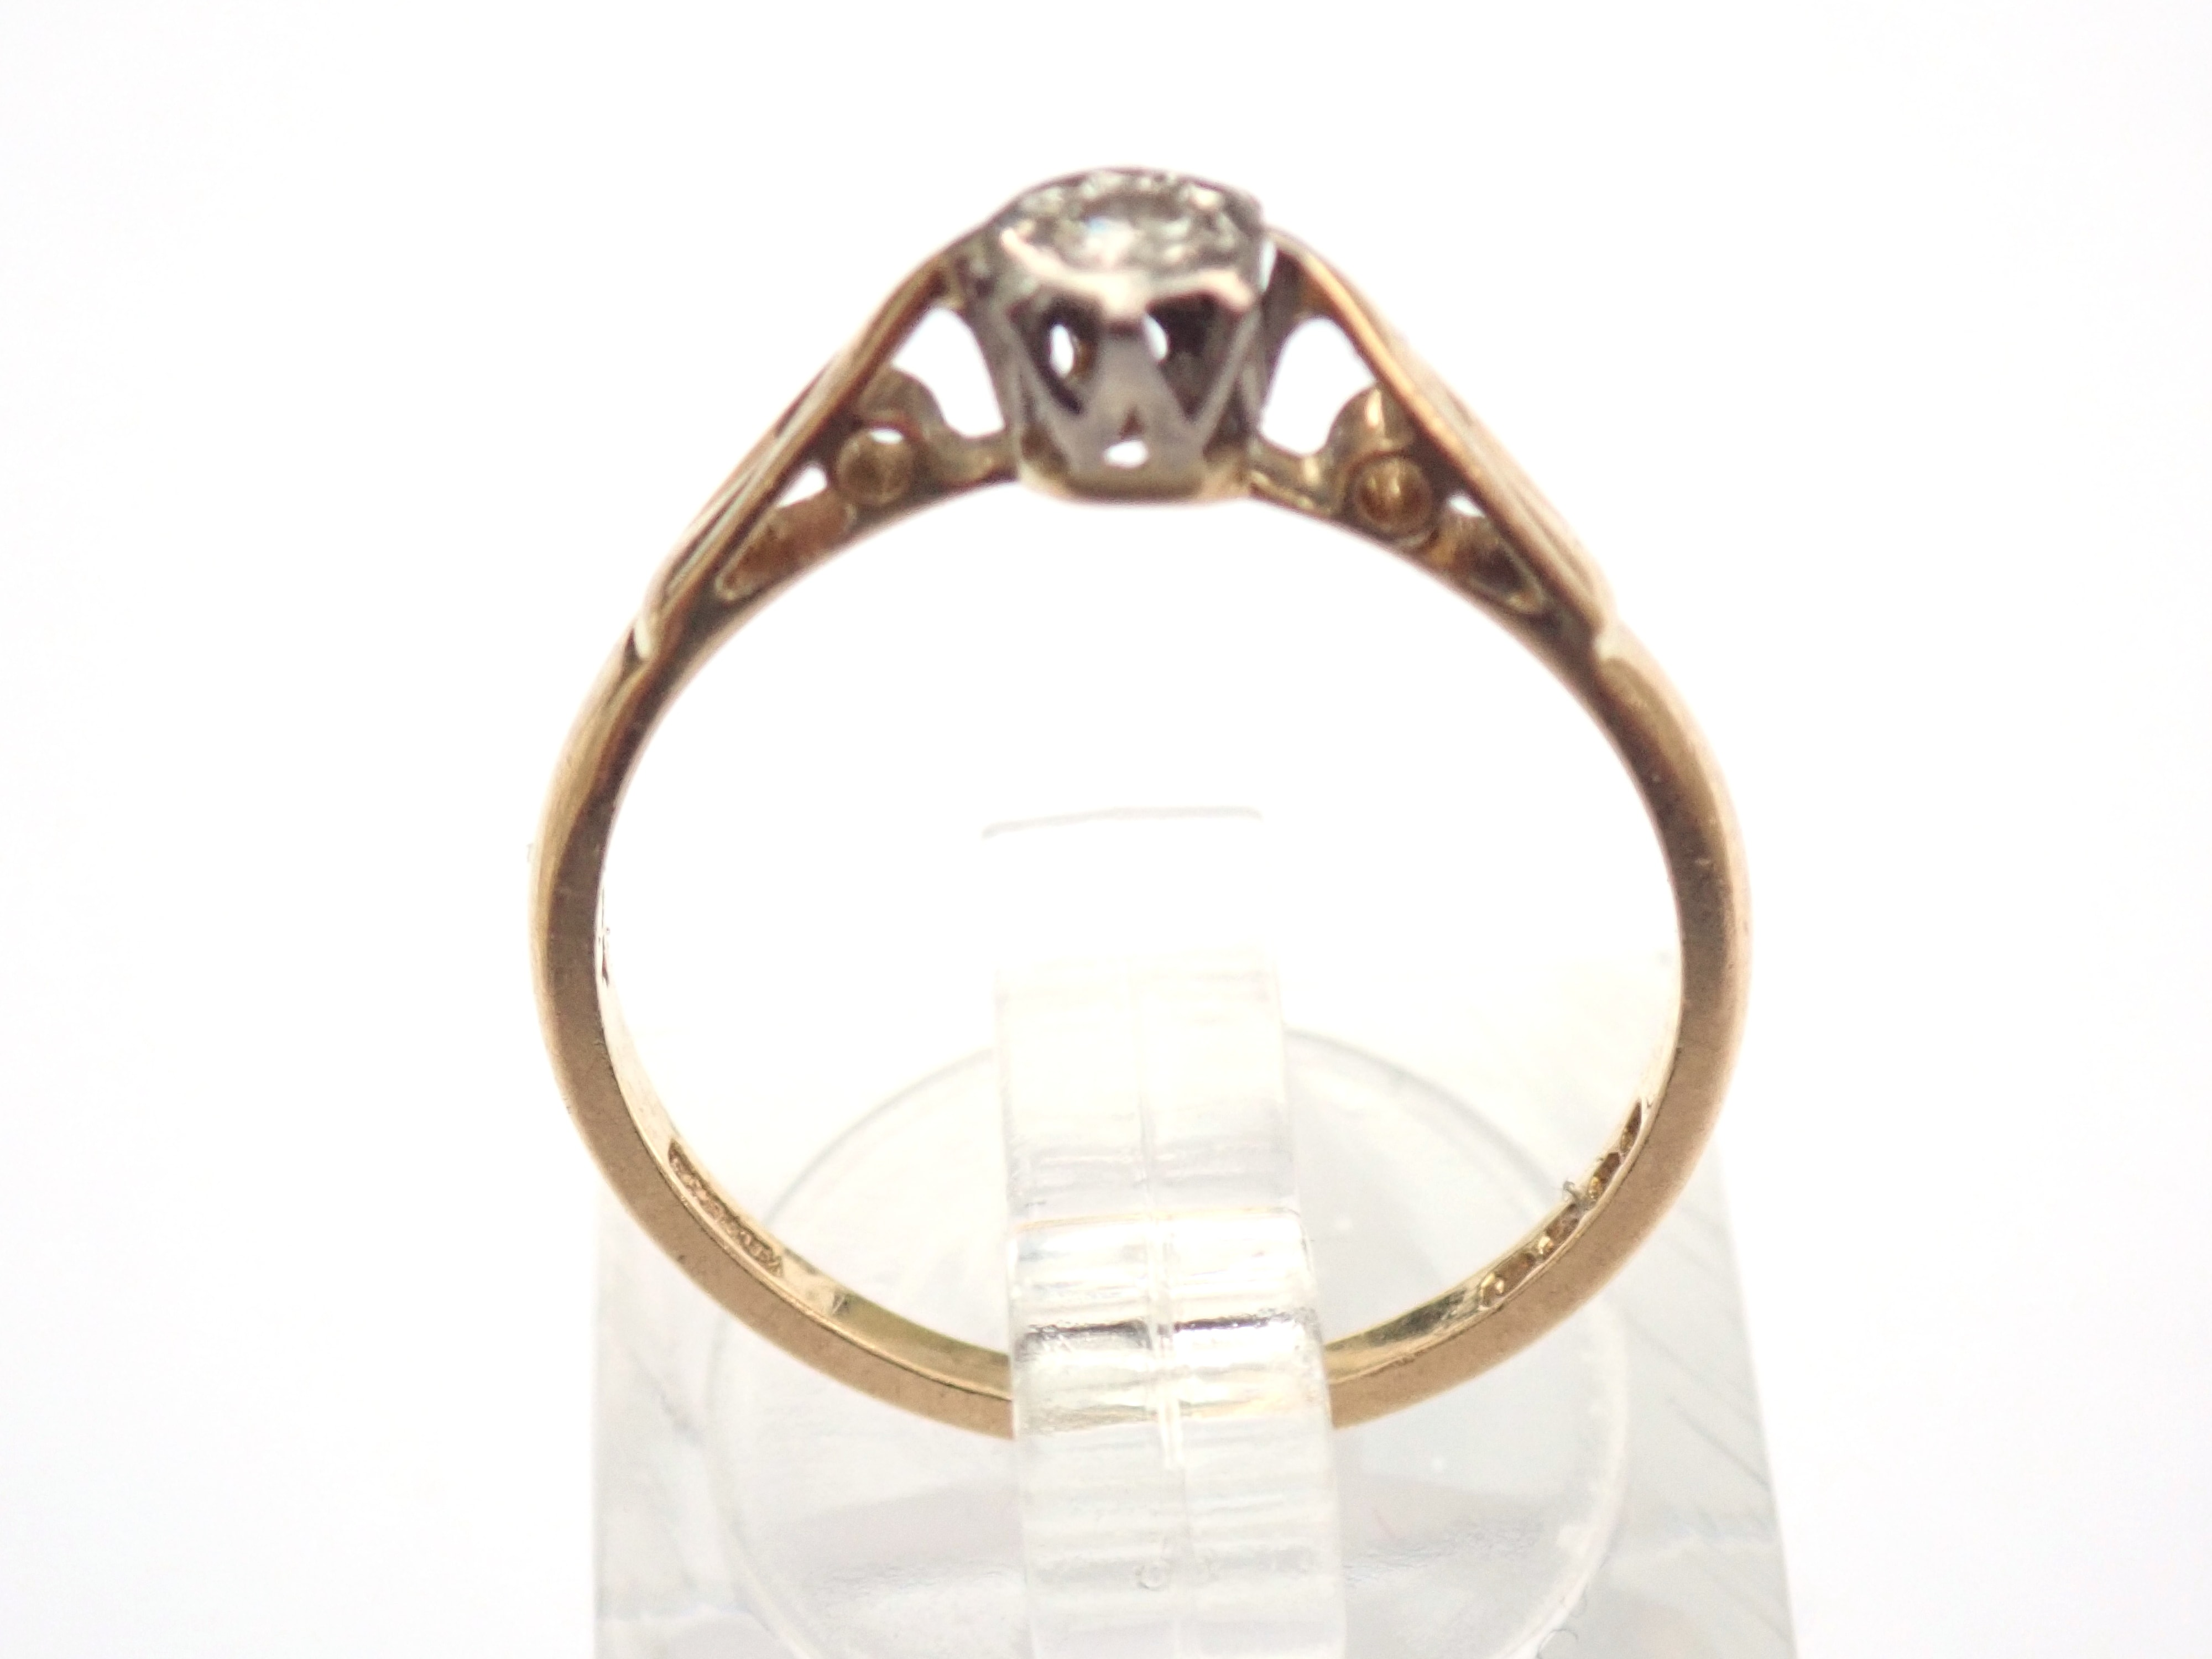 18K Gold 0.05ct Diamond Illusion Setting Ring Size M London Hallmark 1965 2.0gr #60